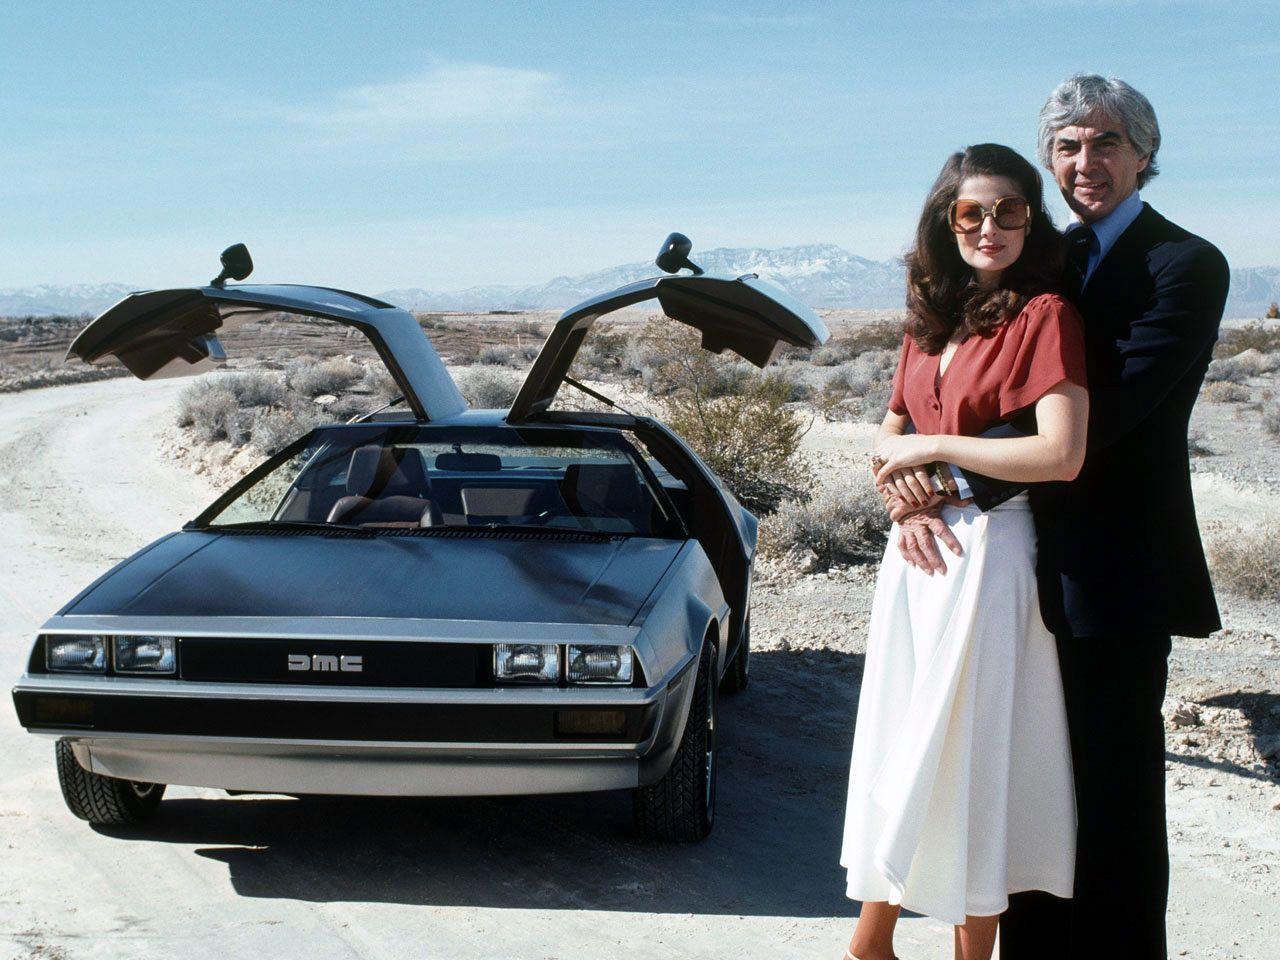 DeLorean DMC 12 Prototype (Ital Design)